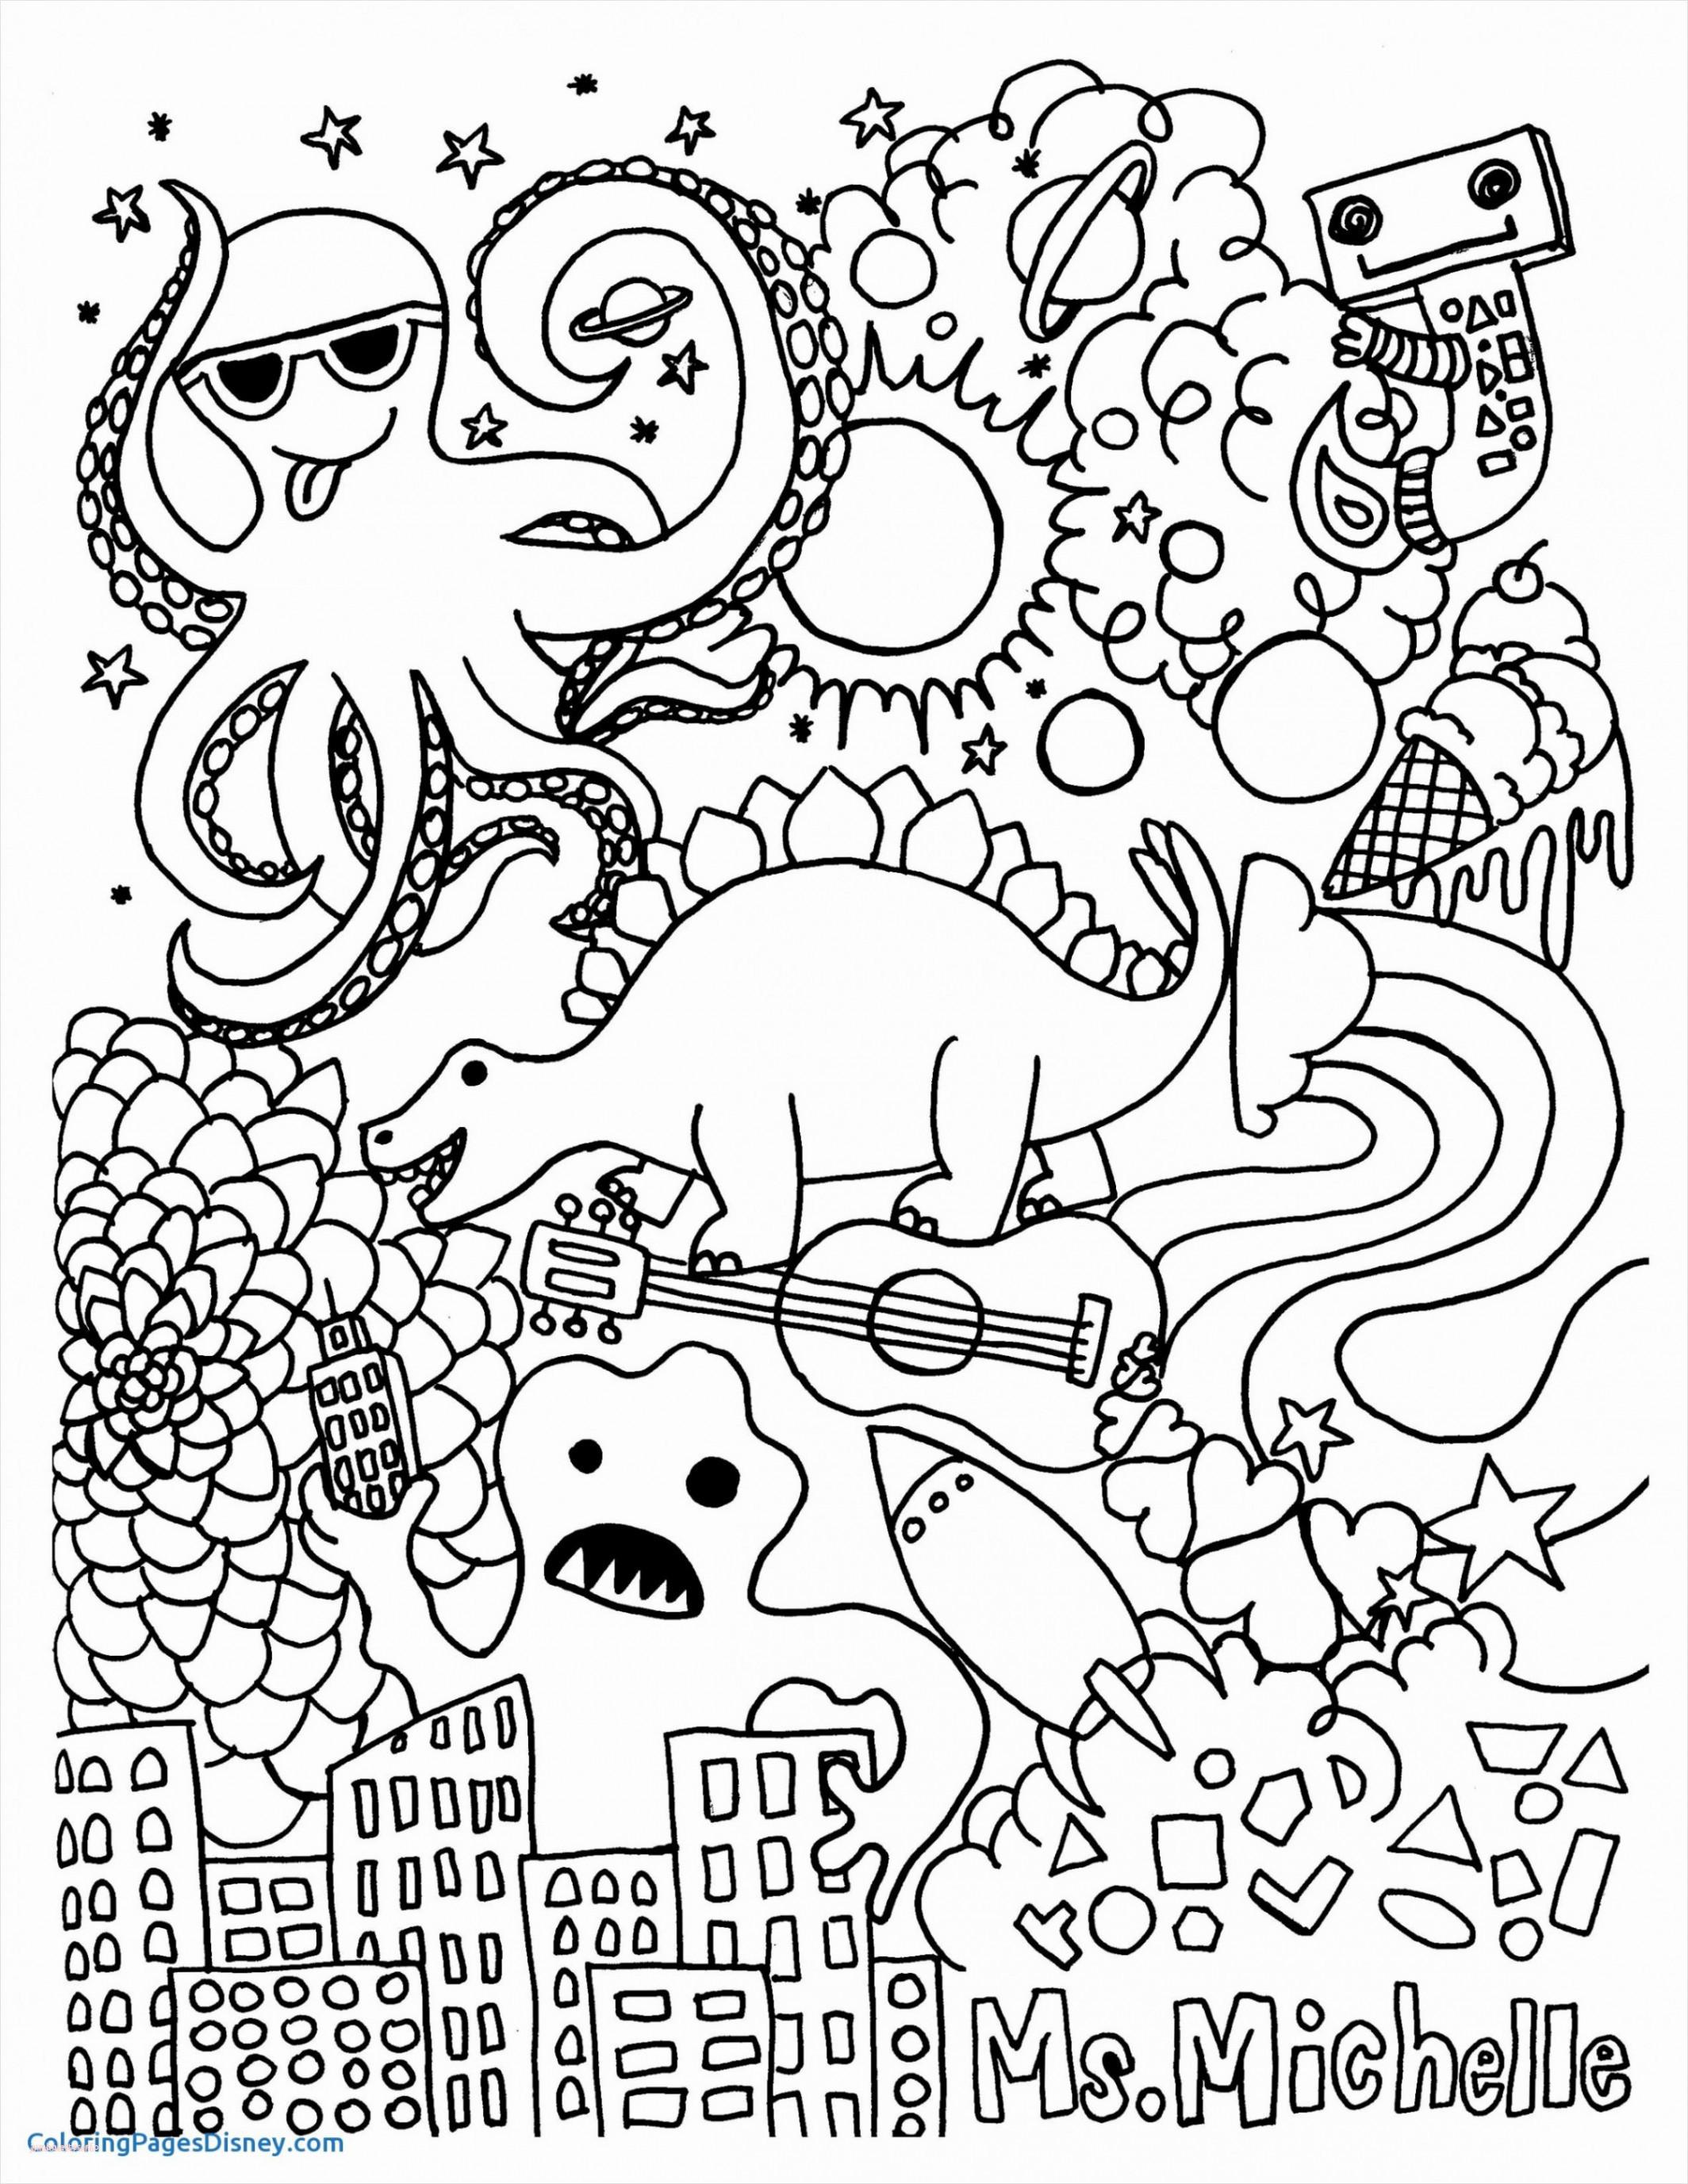 Ausmalbilder 101 Dalmatiner Einzigartig Mandala Coloring Books Sammlung